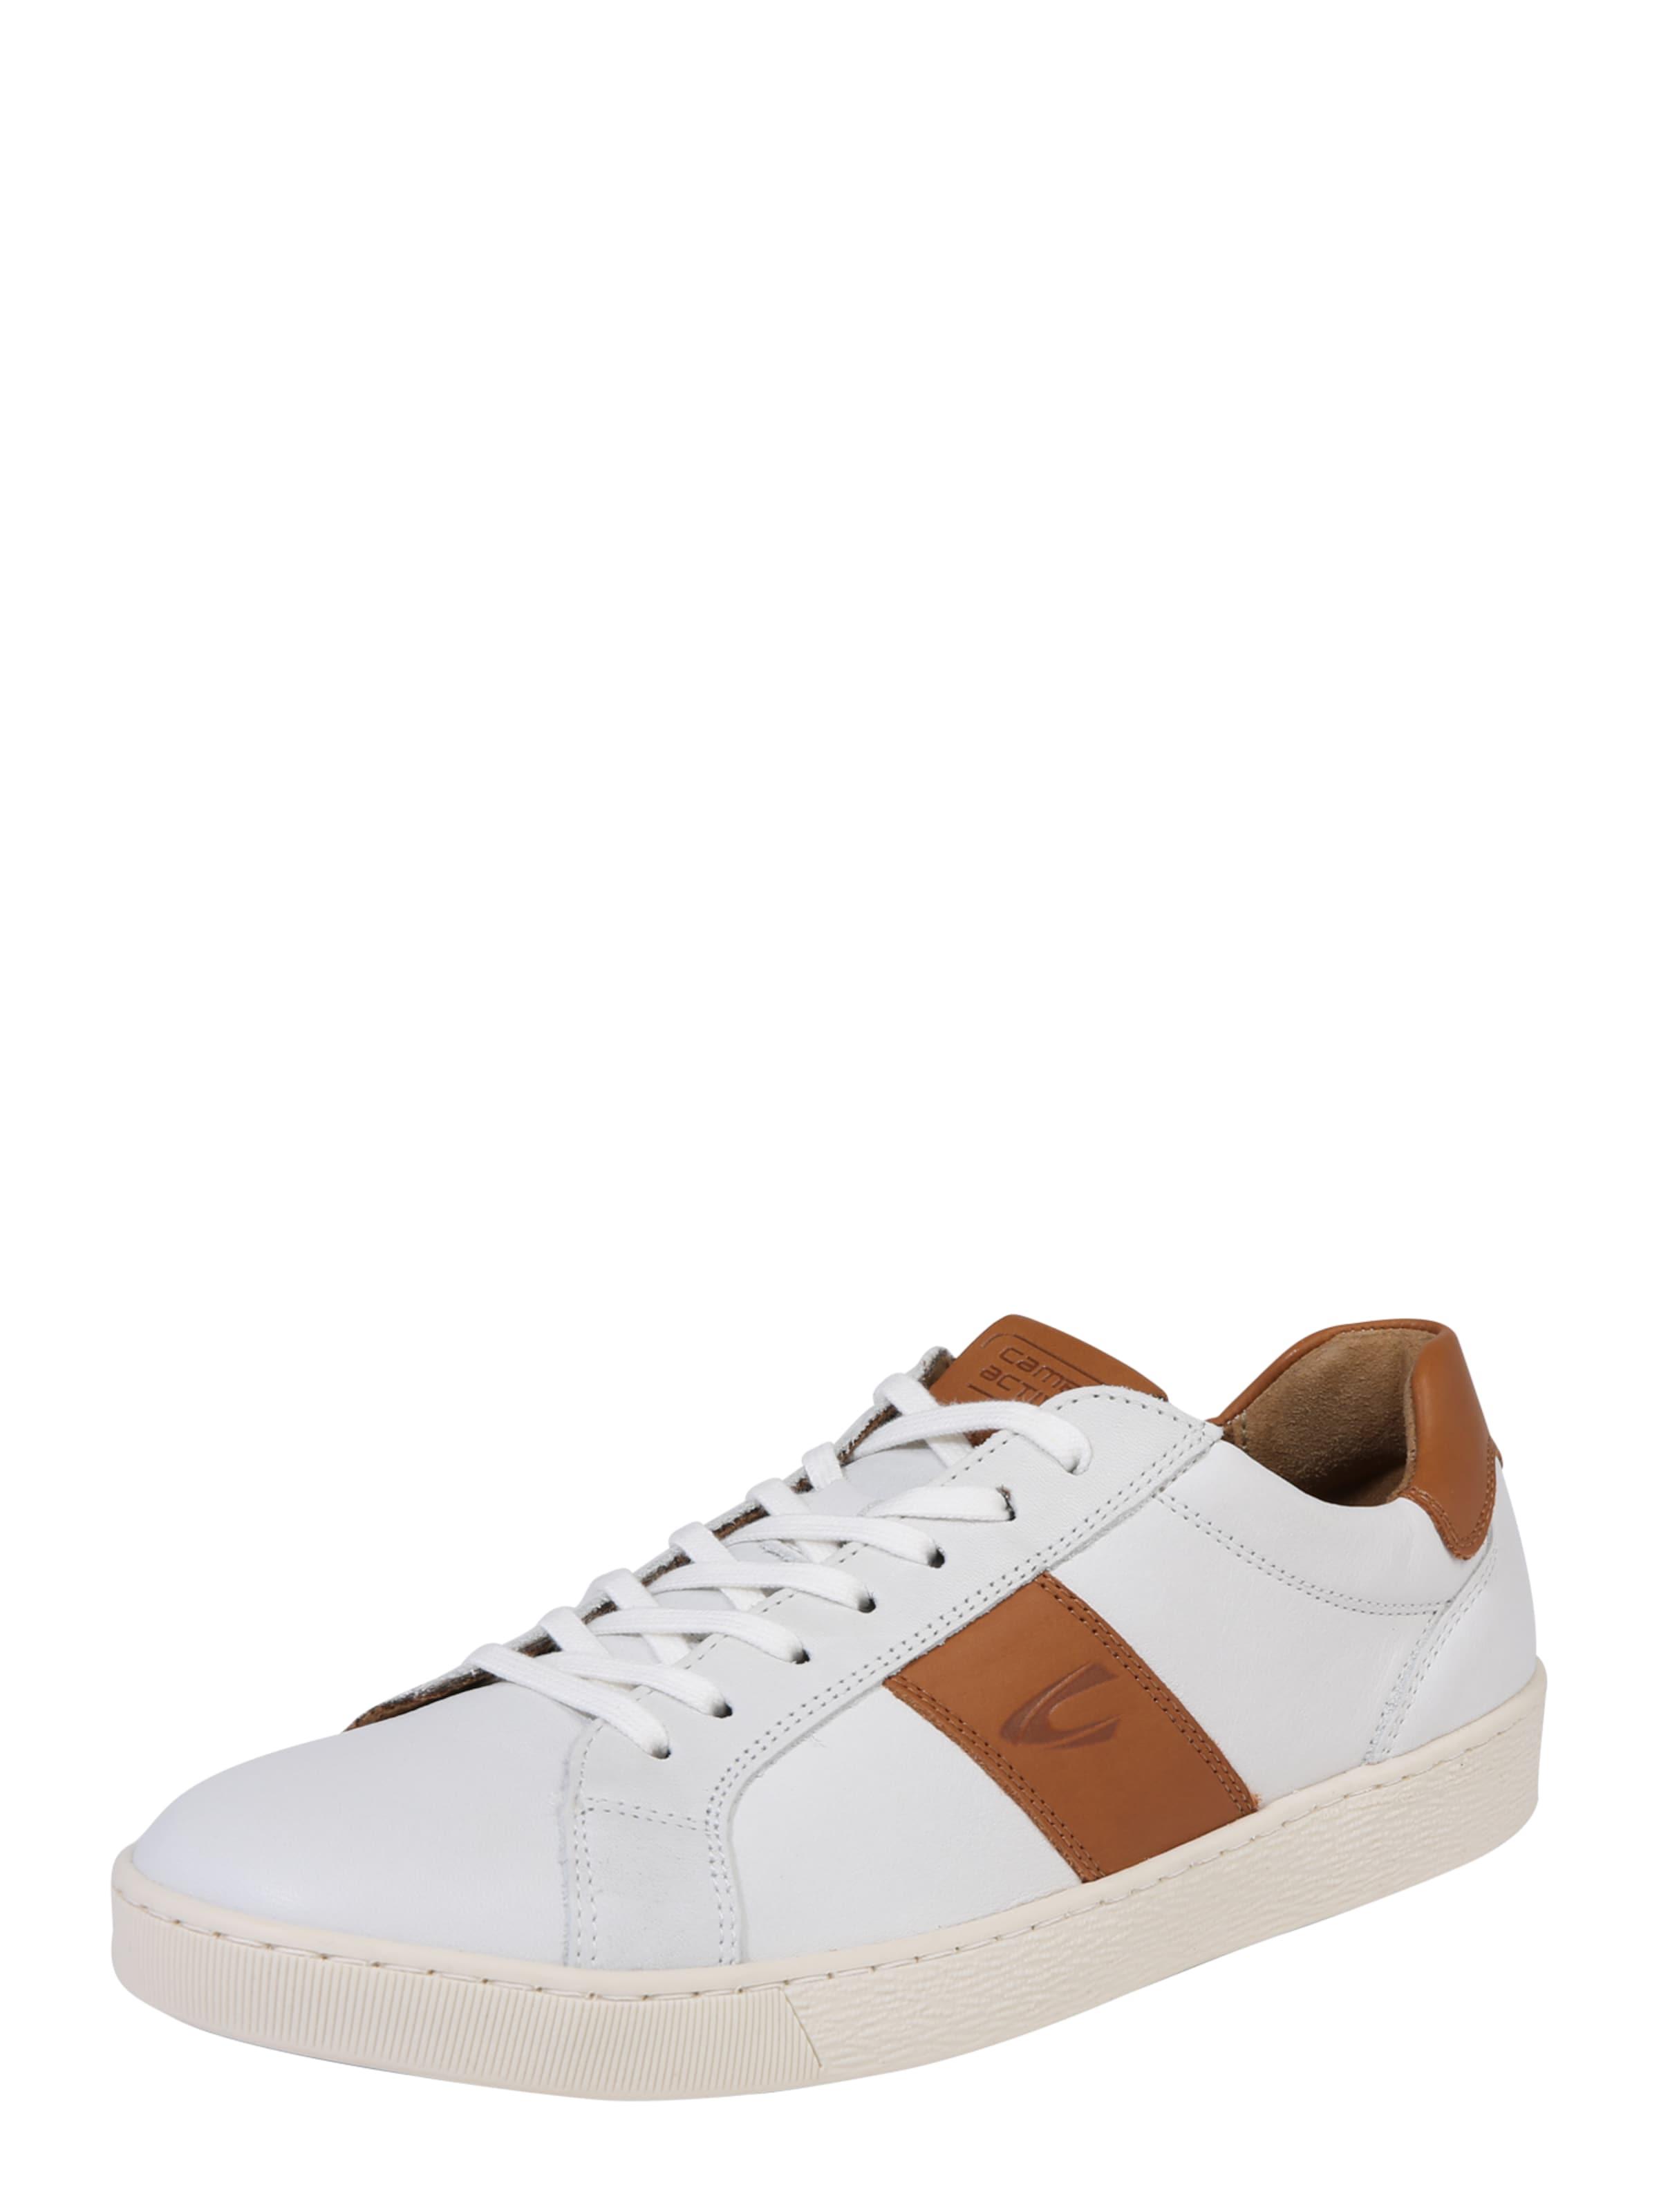 In BraunWeiß 11' 'tonic Active Sneaker Camel rCoxedB